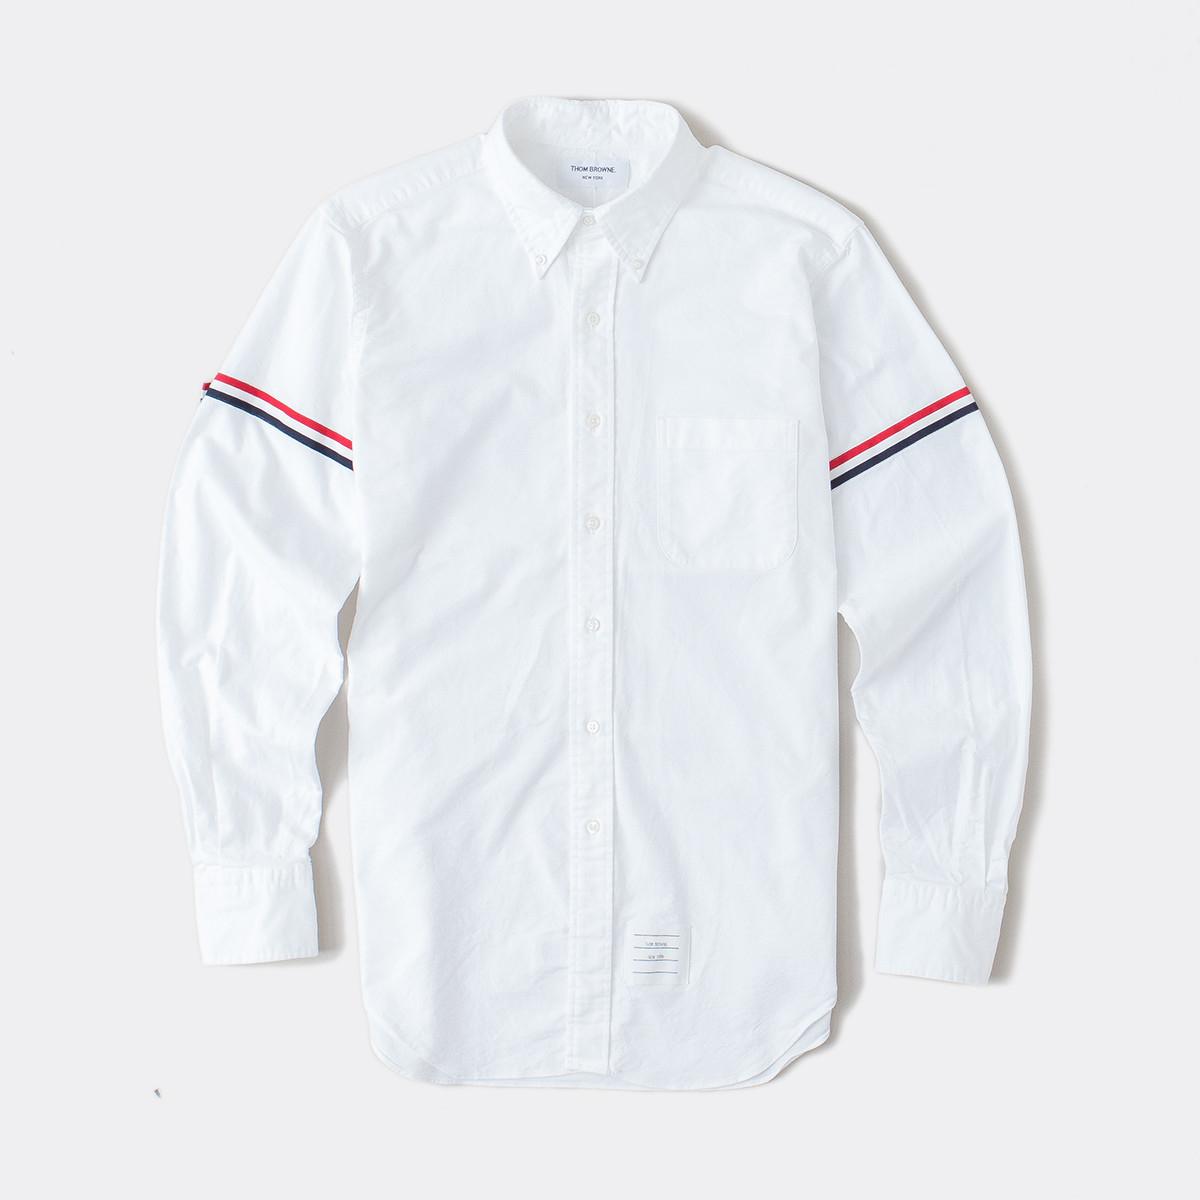 Thom browne armband dsquared2 uk for Thom browne white shirt